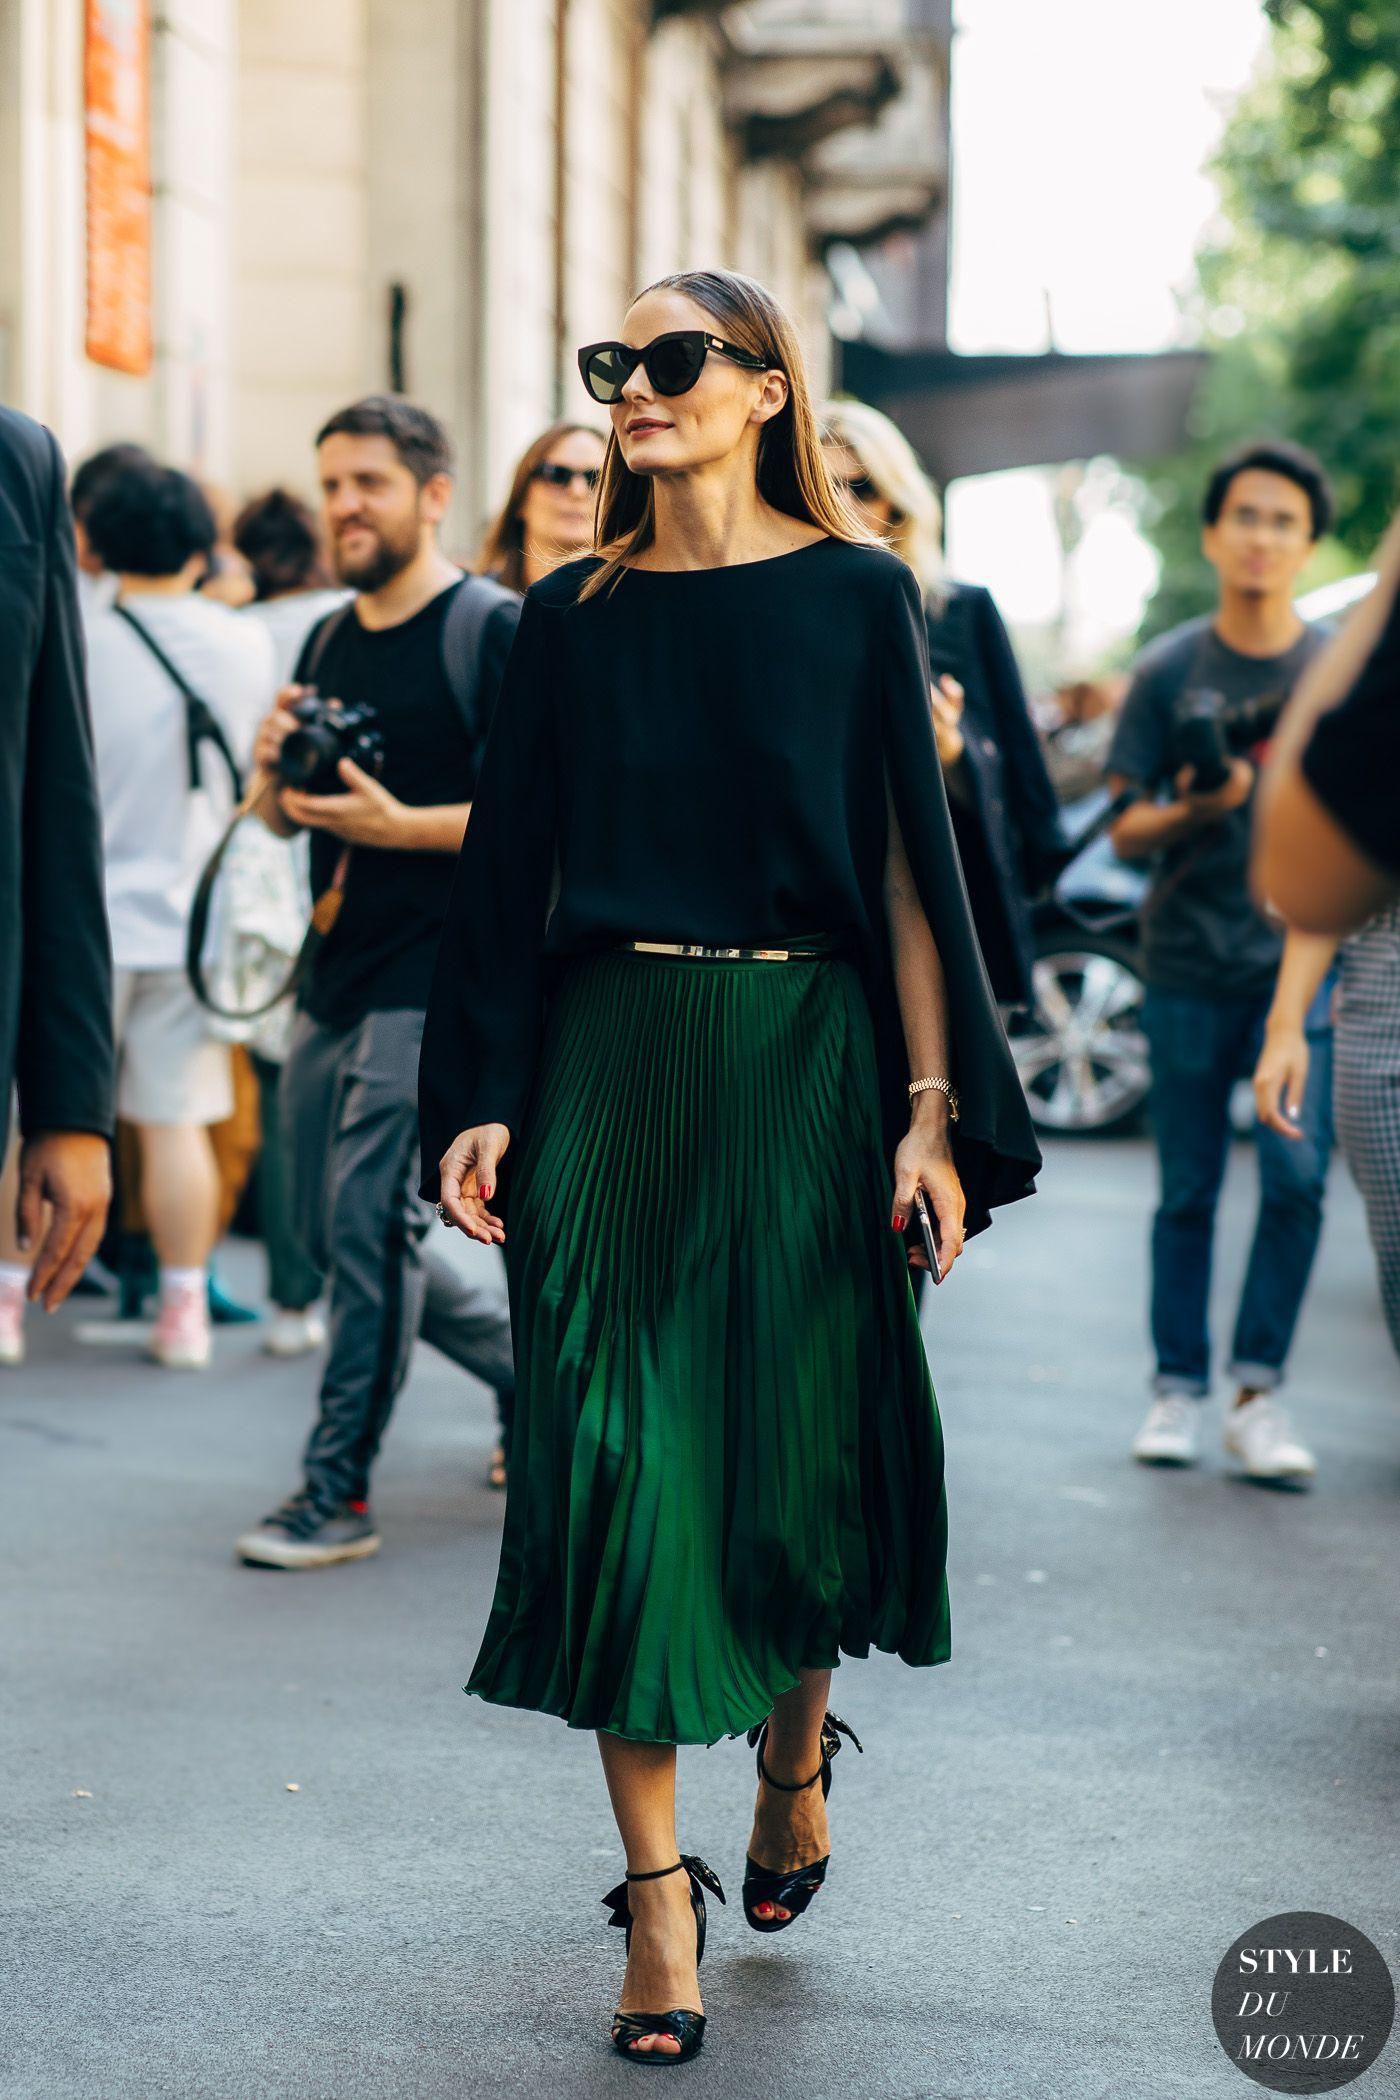 Olivia Palermo by STYLEDUMONDE Street Style Fashion  Photography20180921 48A9688 36fdb78033e5